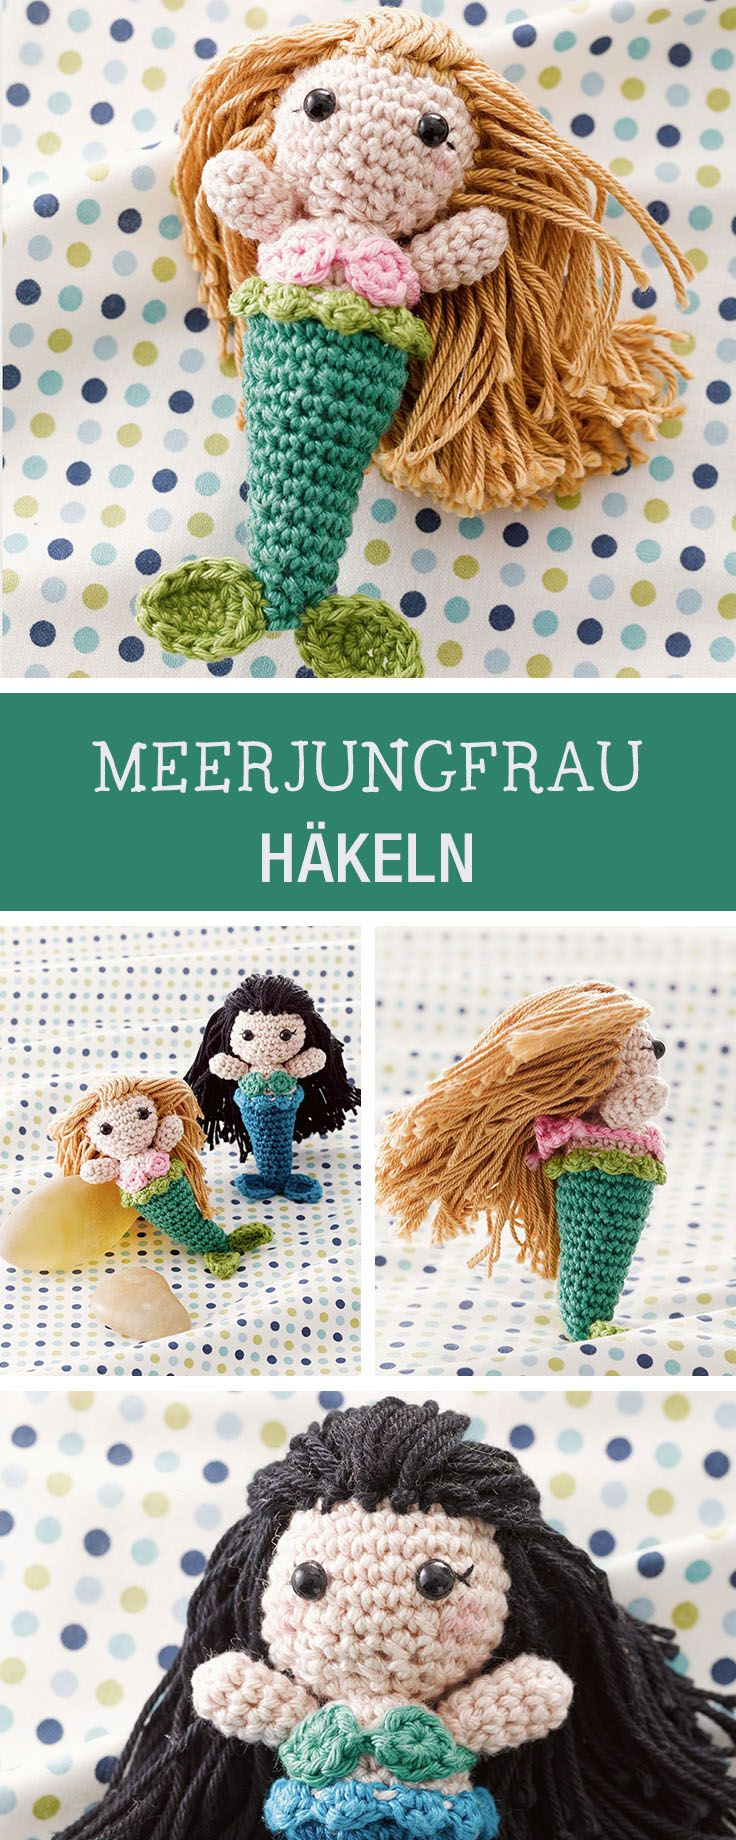 Süße Häkelanleitung für eine Amigurumi Meerjungfrau / diy amigurumi: how to crochet a little mermaid via DaWanda.com